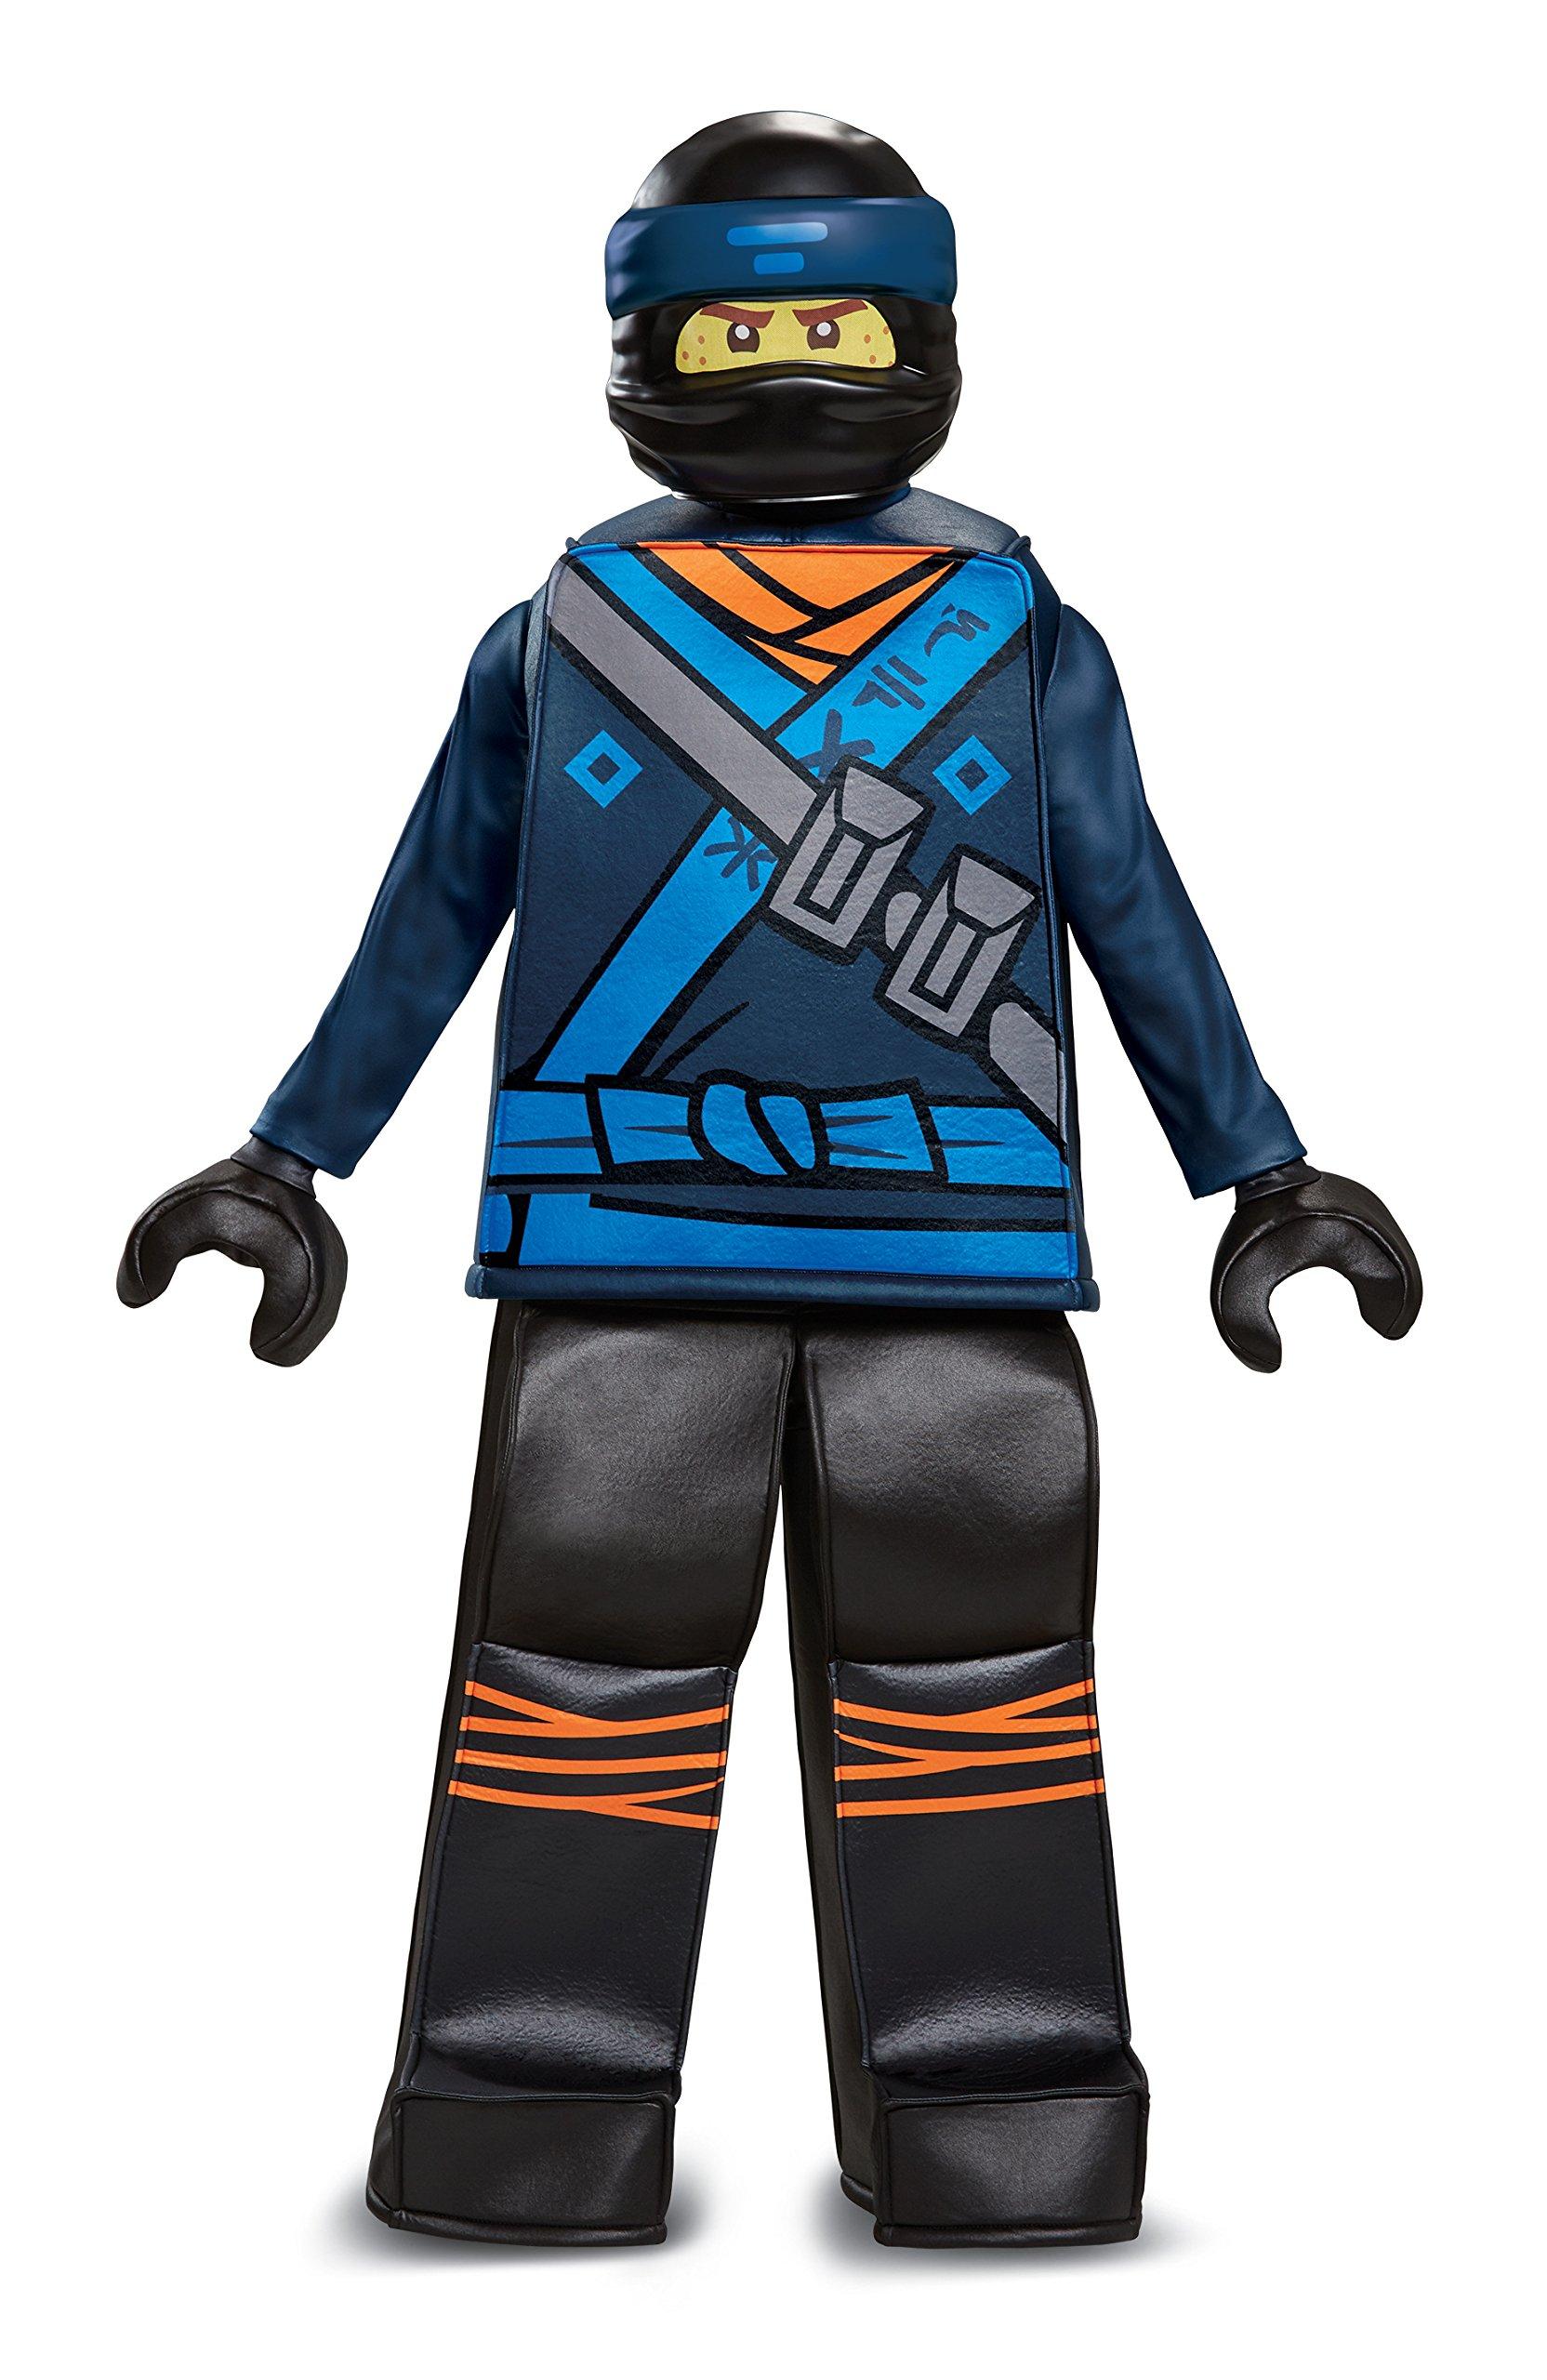 Jay LEGO Ninjago Movie Prestige Costume, Blue, Large (10-12)